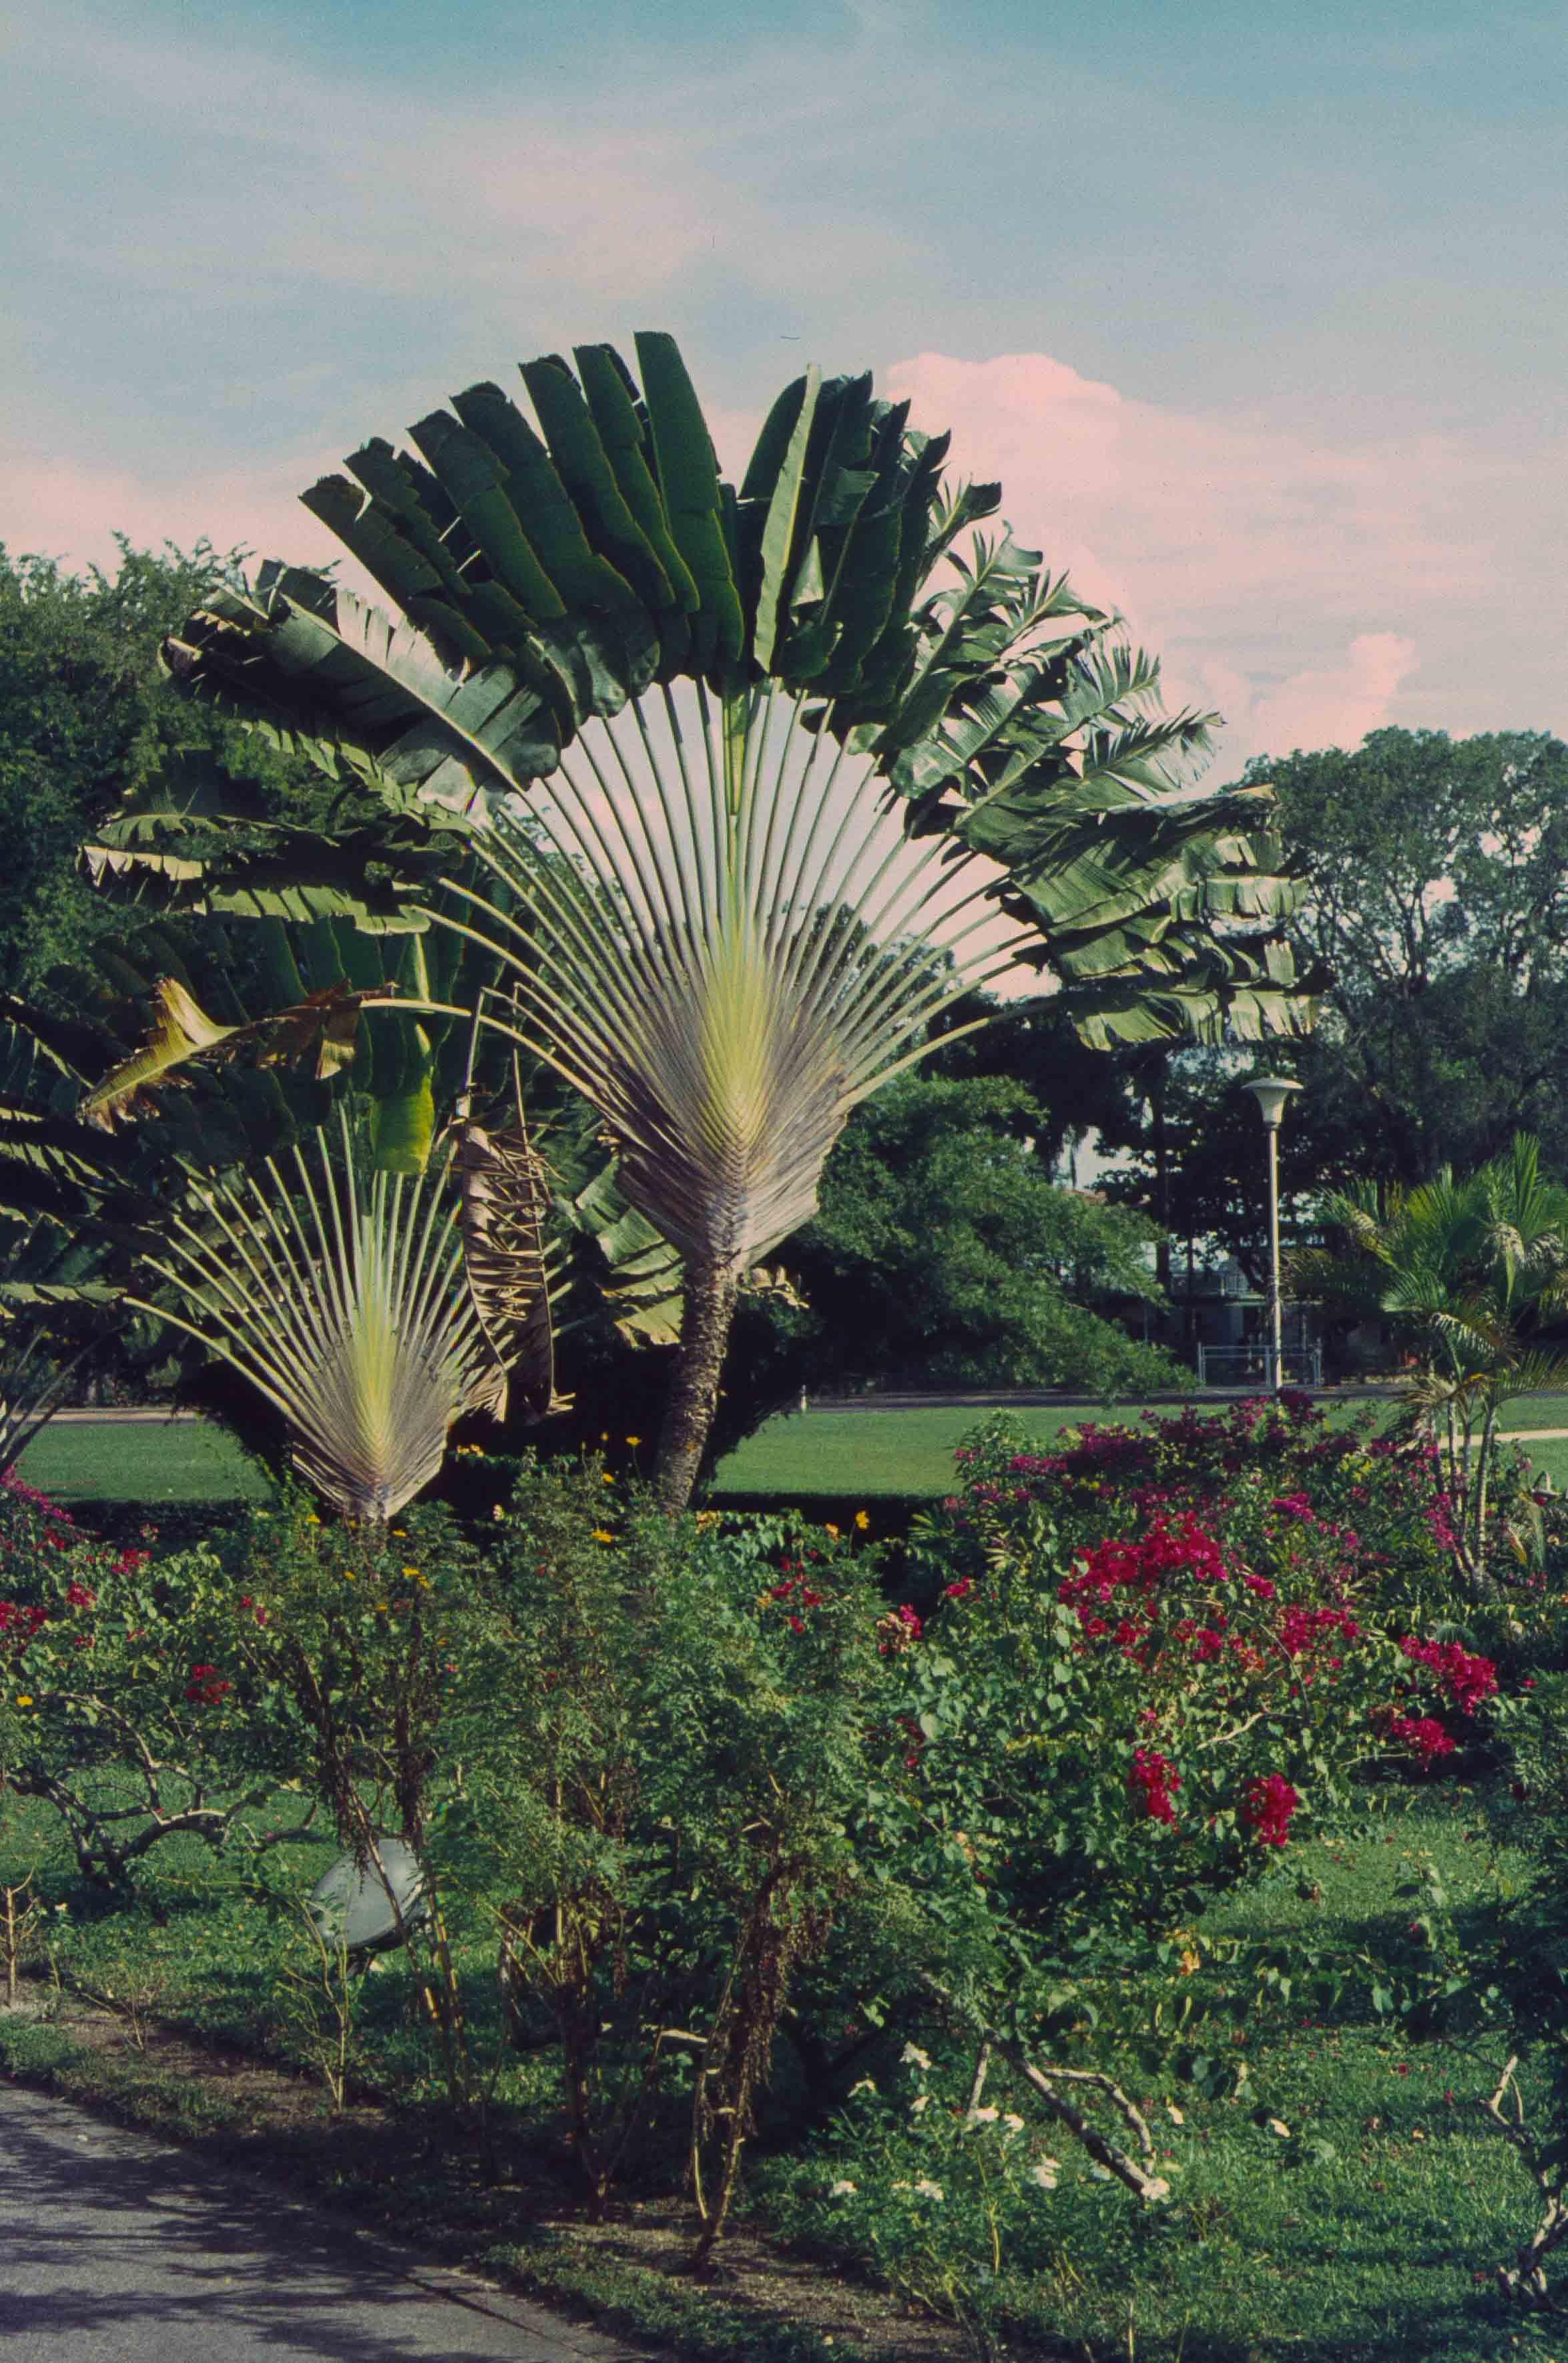 237. Suriname